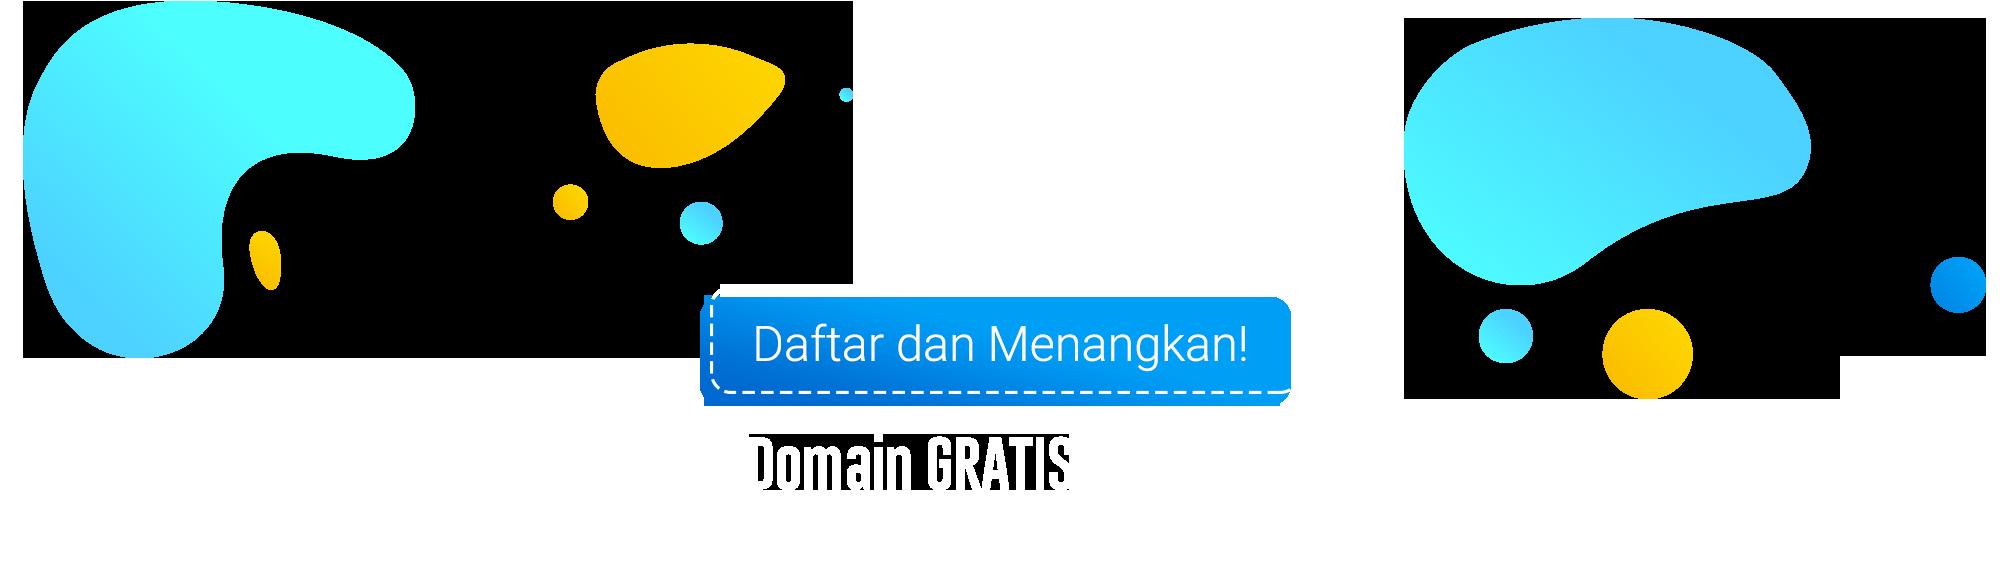 gratis domain xyz